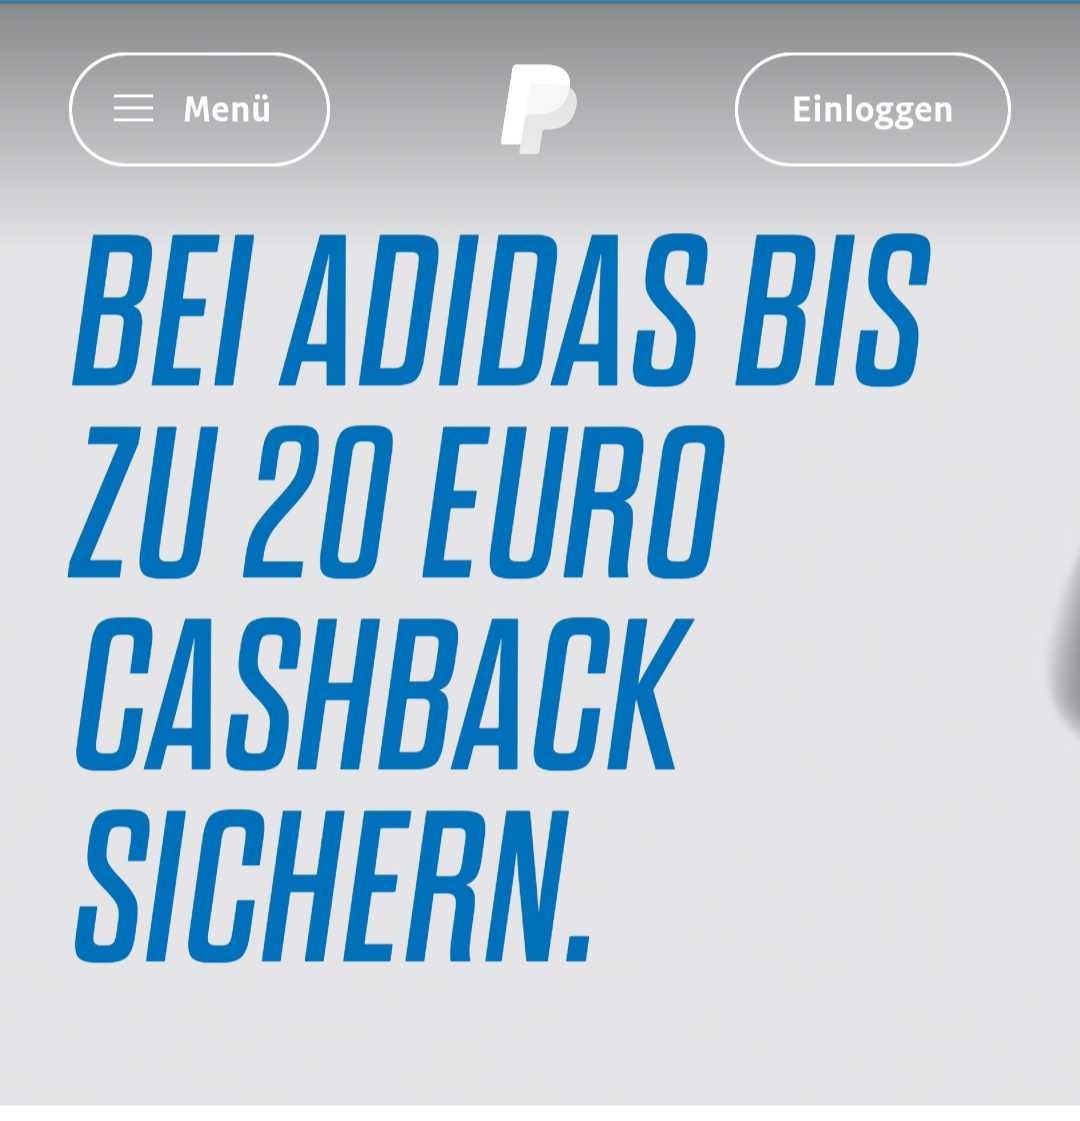 bis 20e cashback auf selbstdesignten adidas schuhe